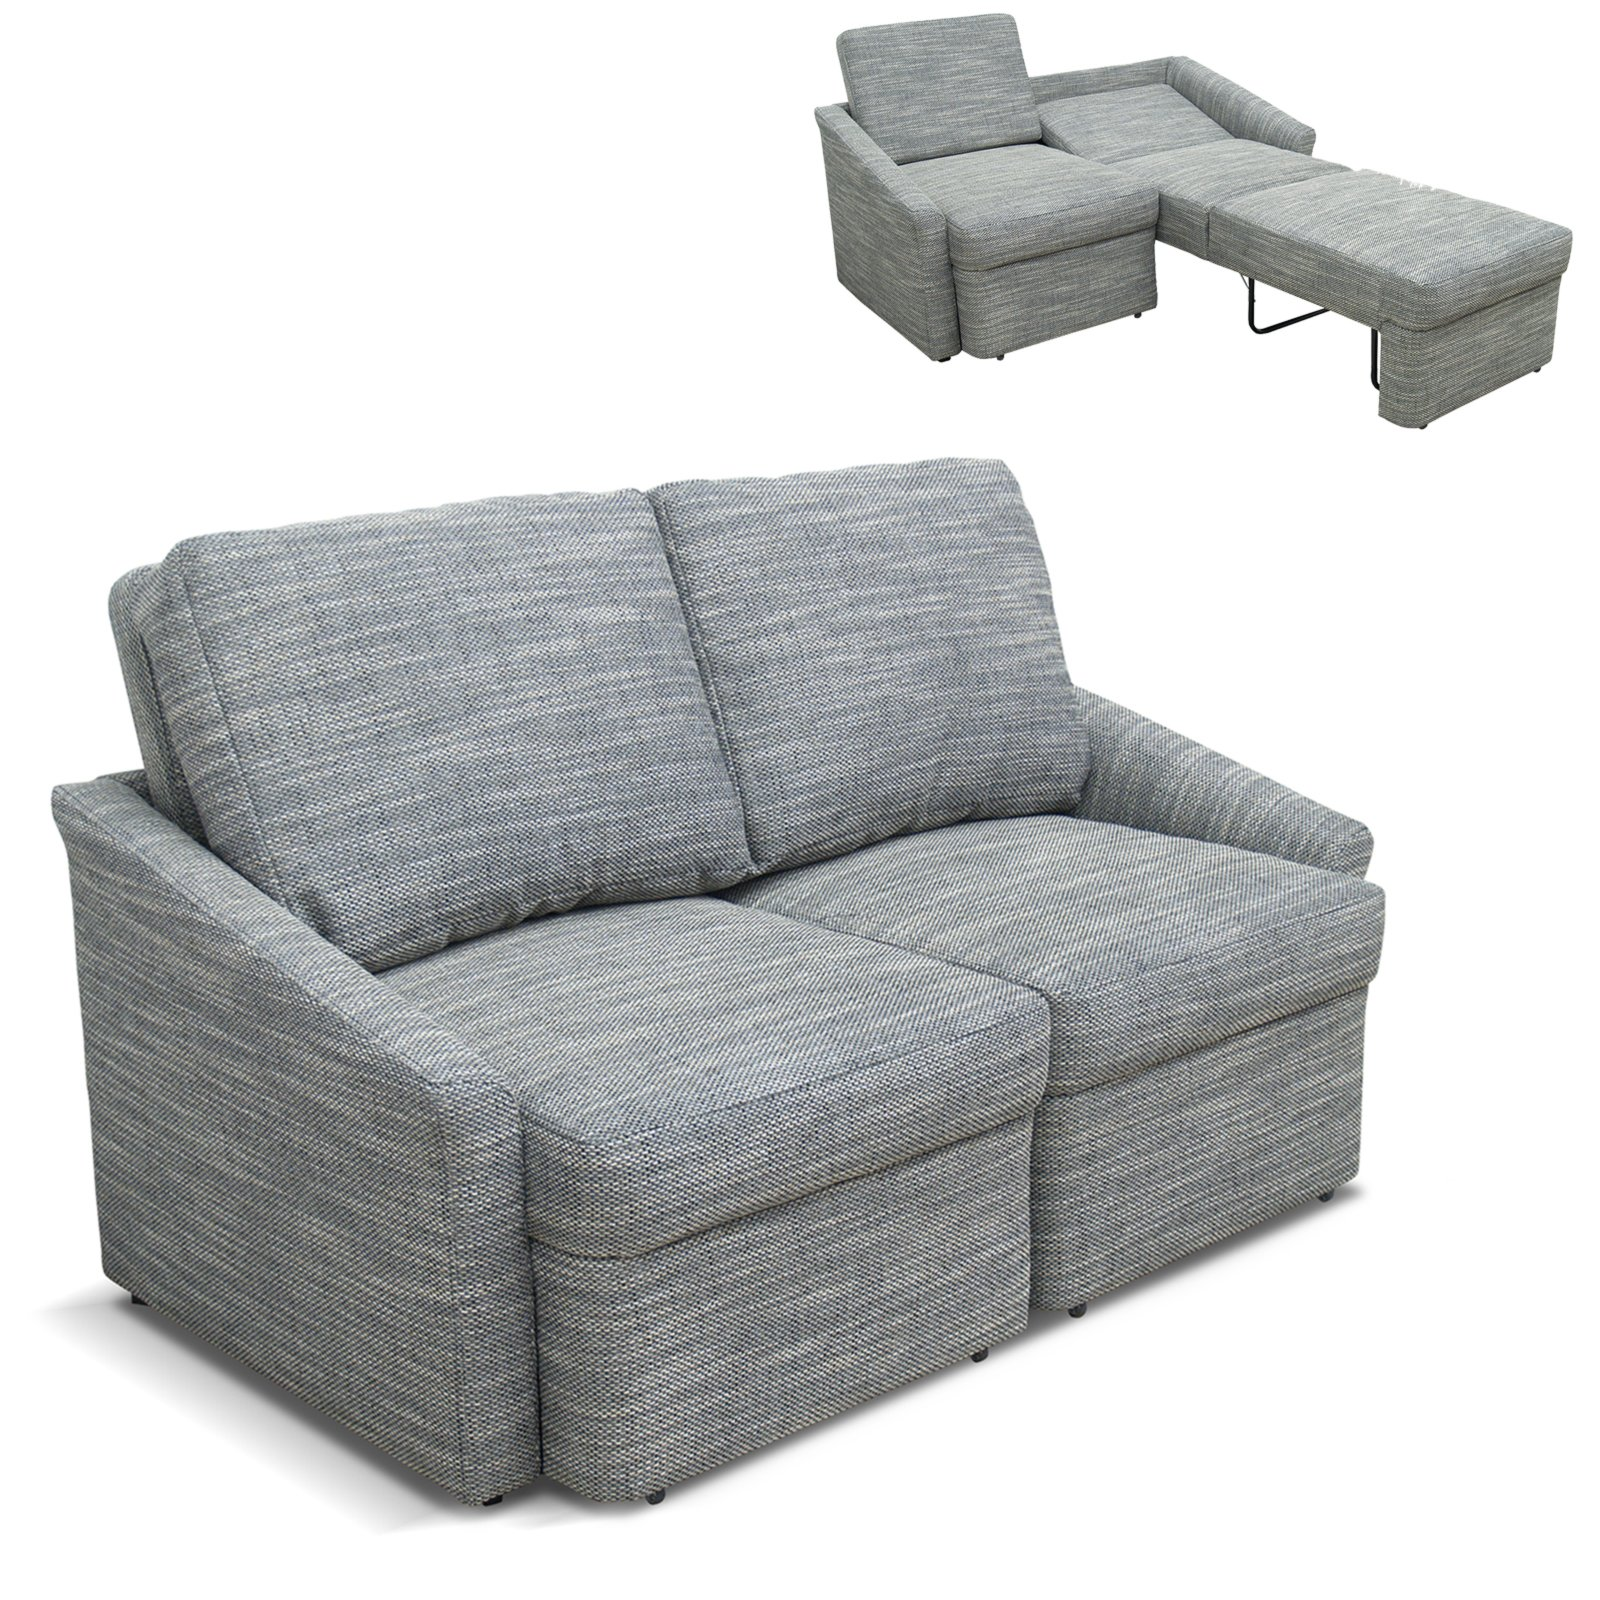 2 Sitzer Boxspringsofa grau weiß mit Liegefunktion